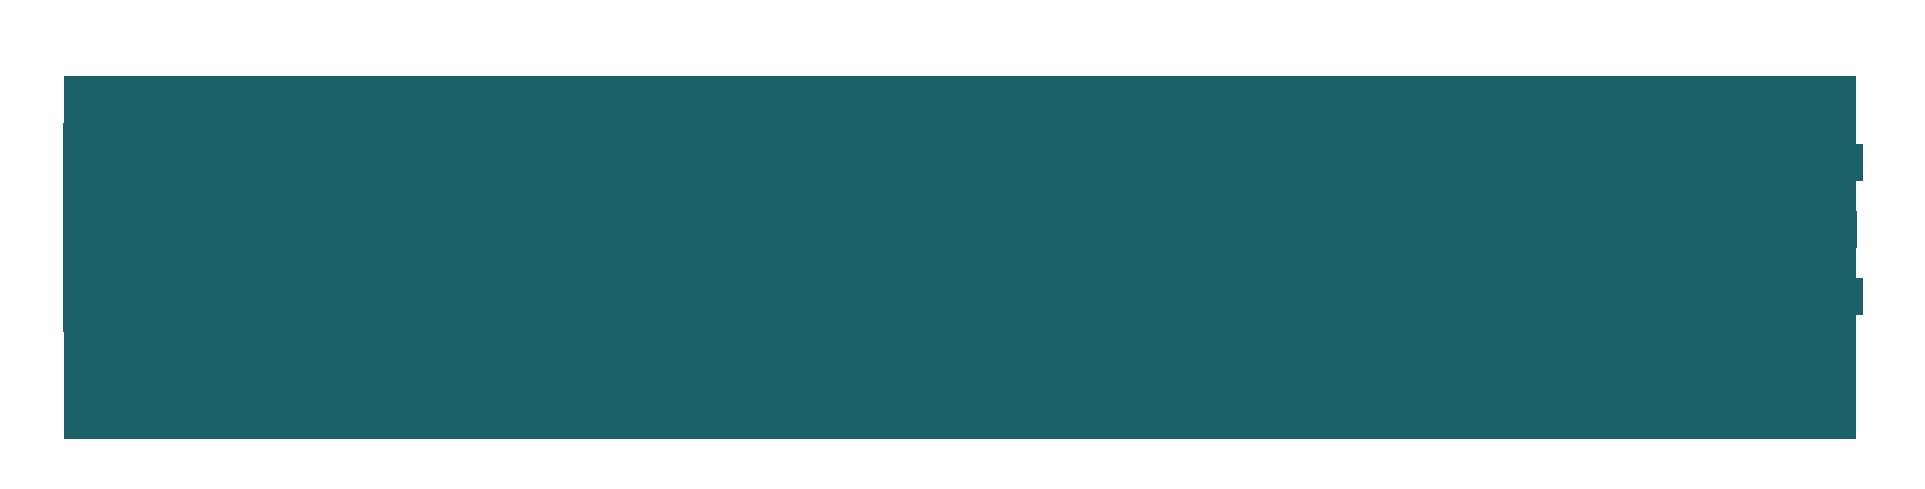 Woocommerce logo2